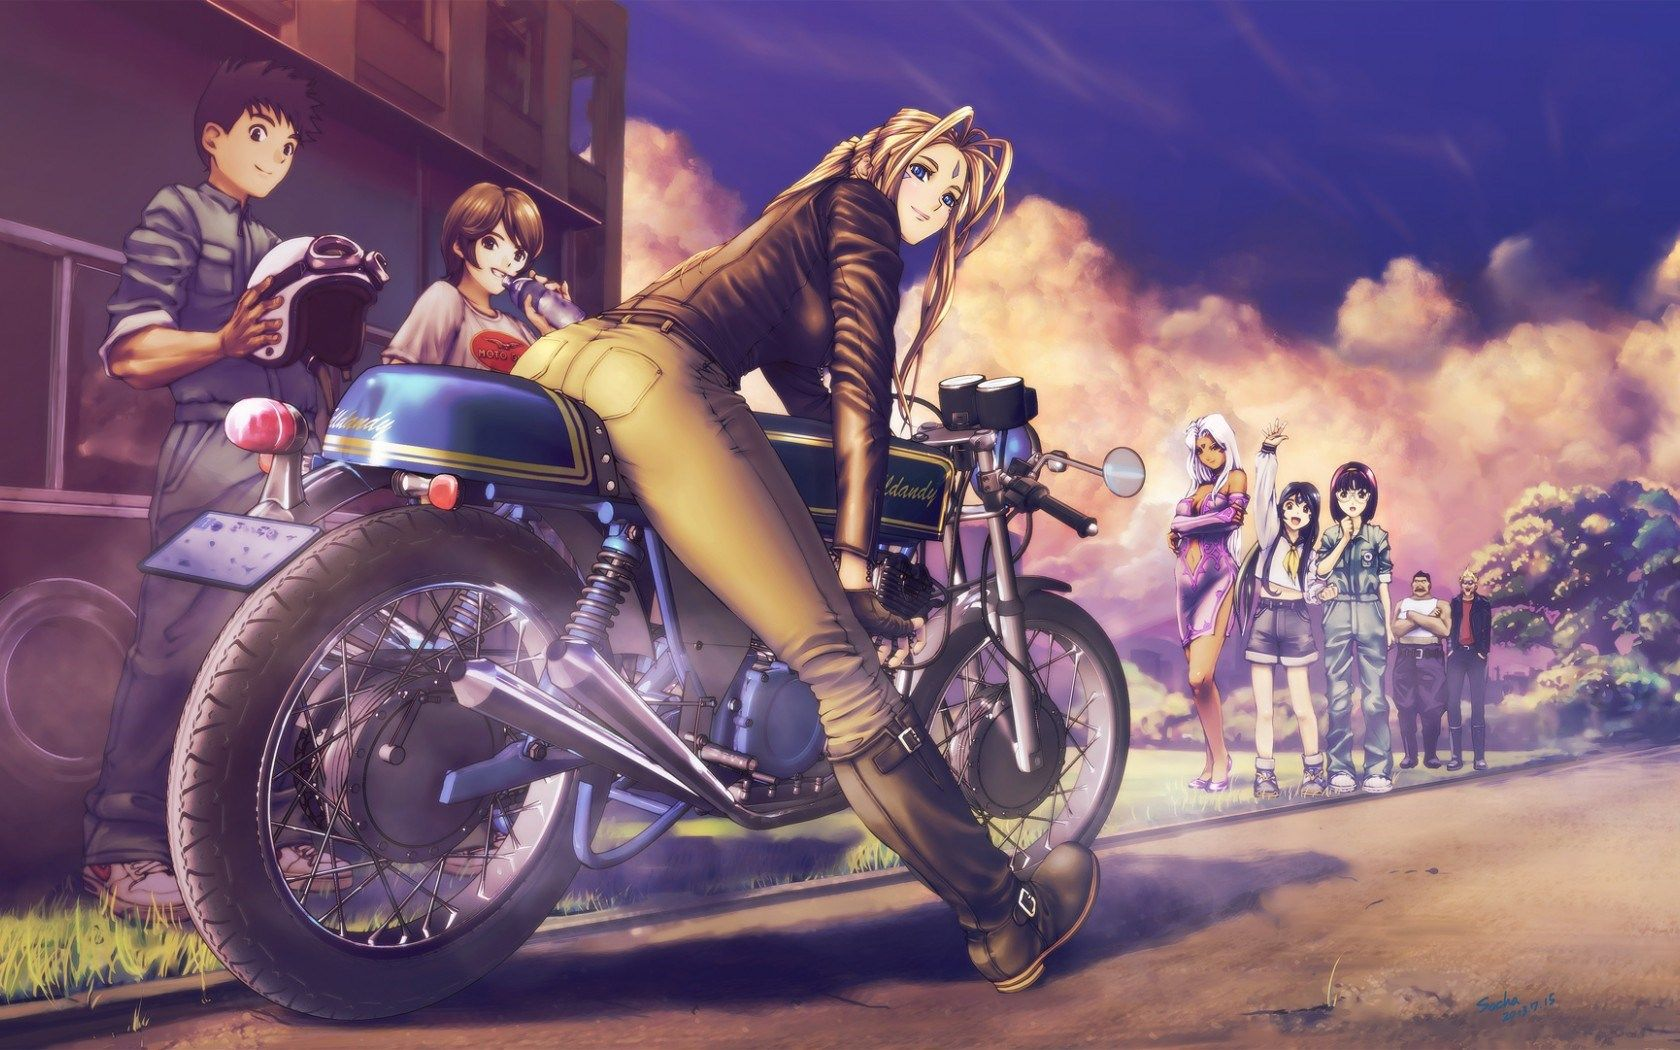 Pin Auf The Art Of Anime